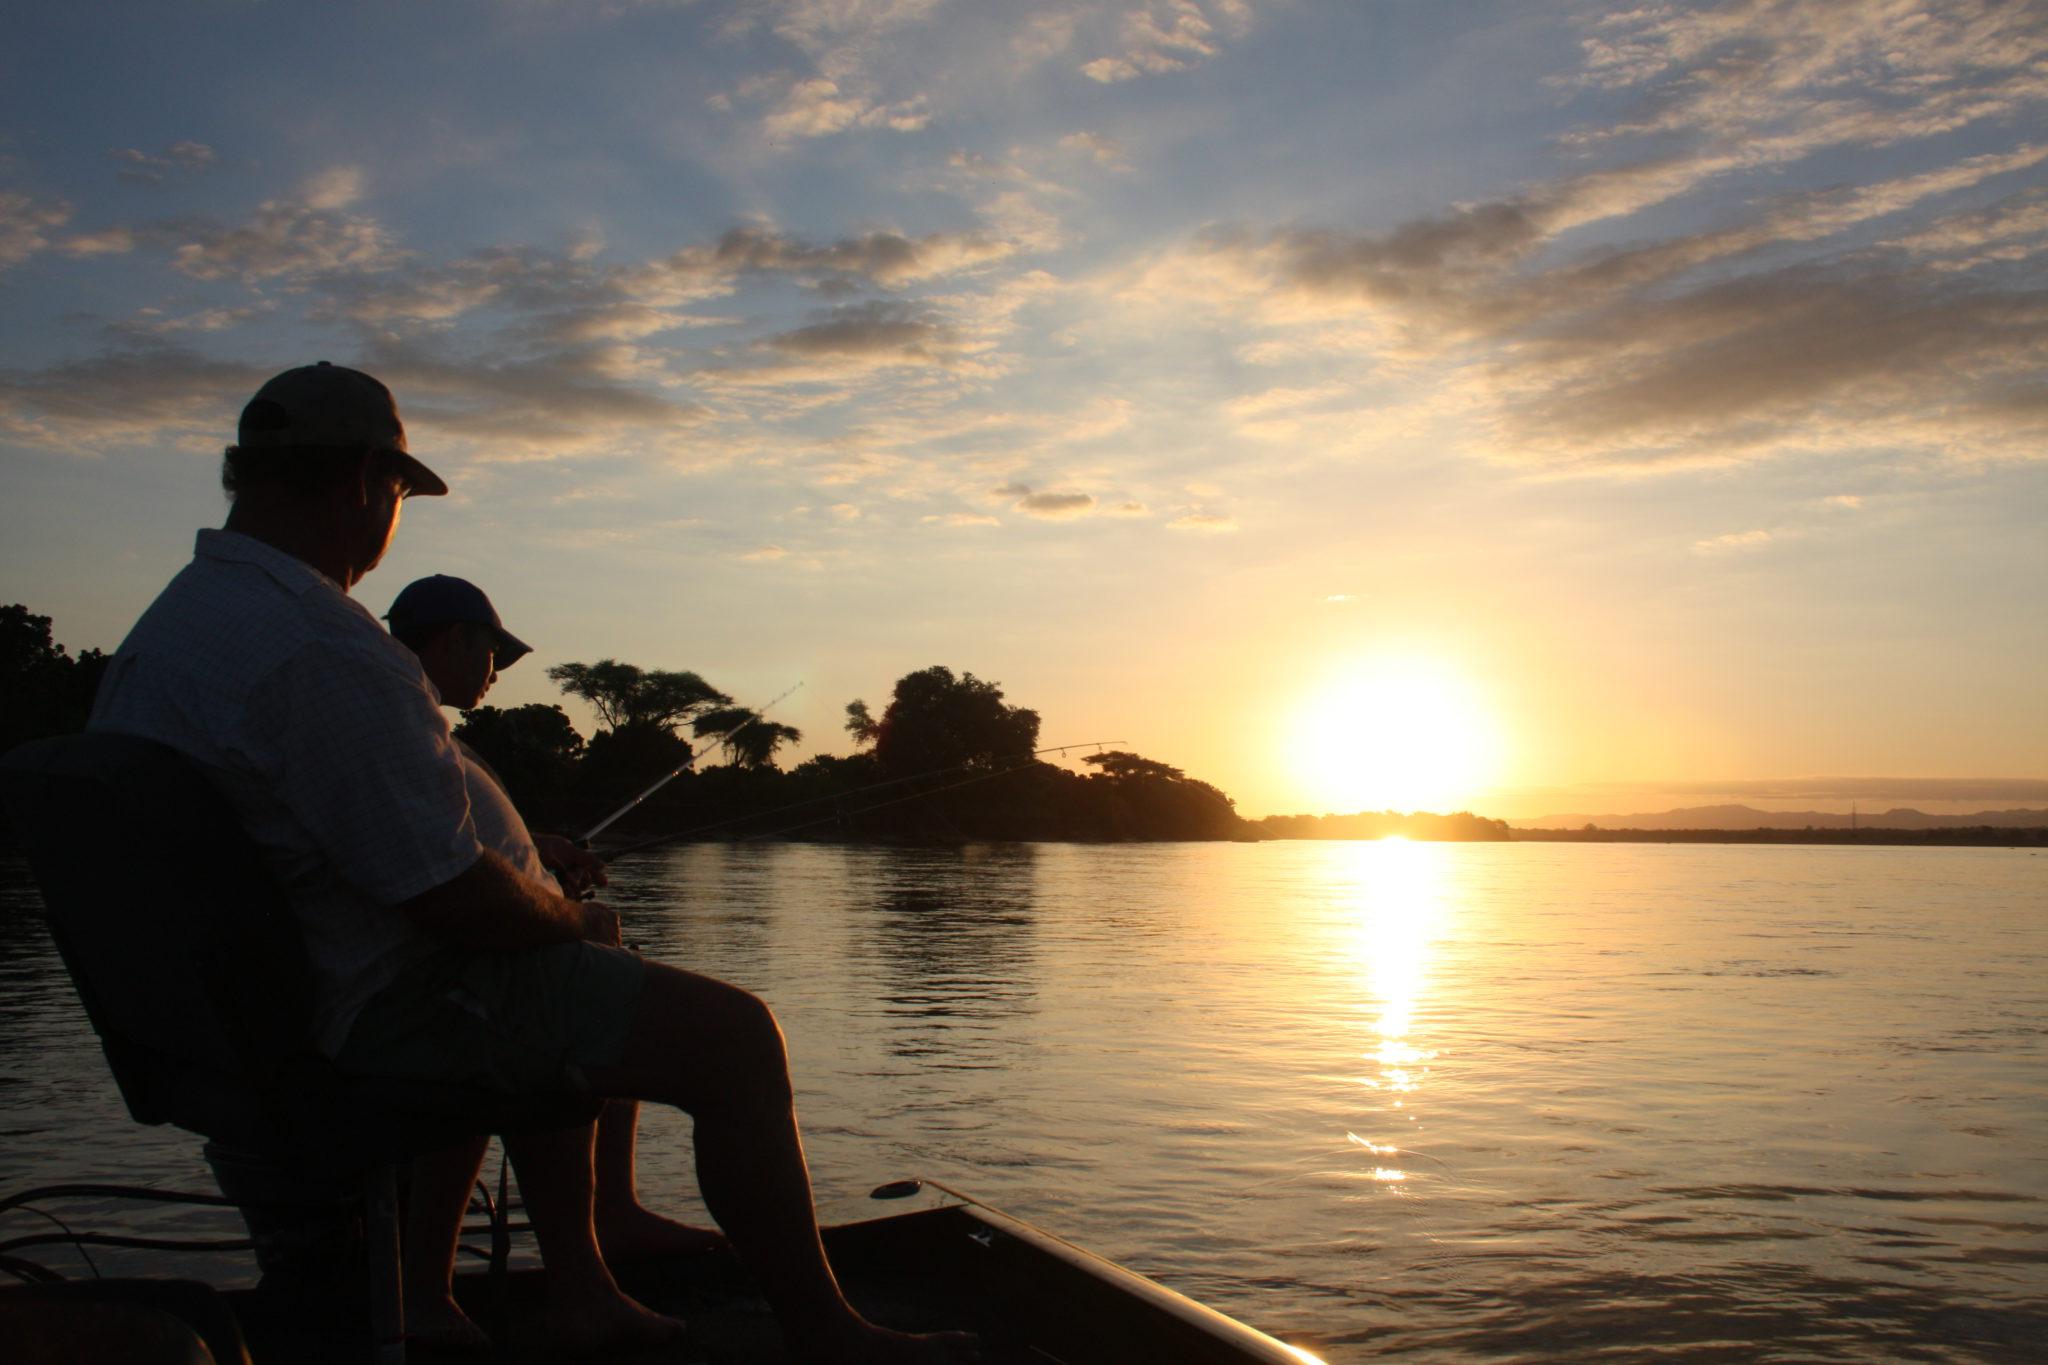 Serene Scenes canoeing safari: Zimbabwe multi activity holiday